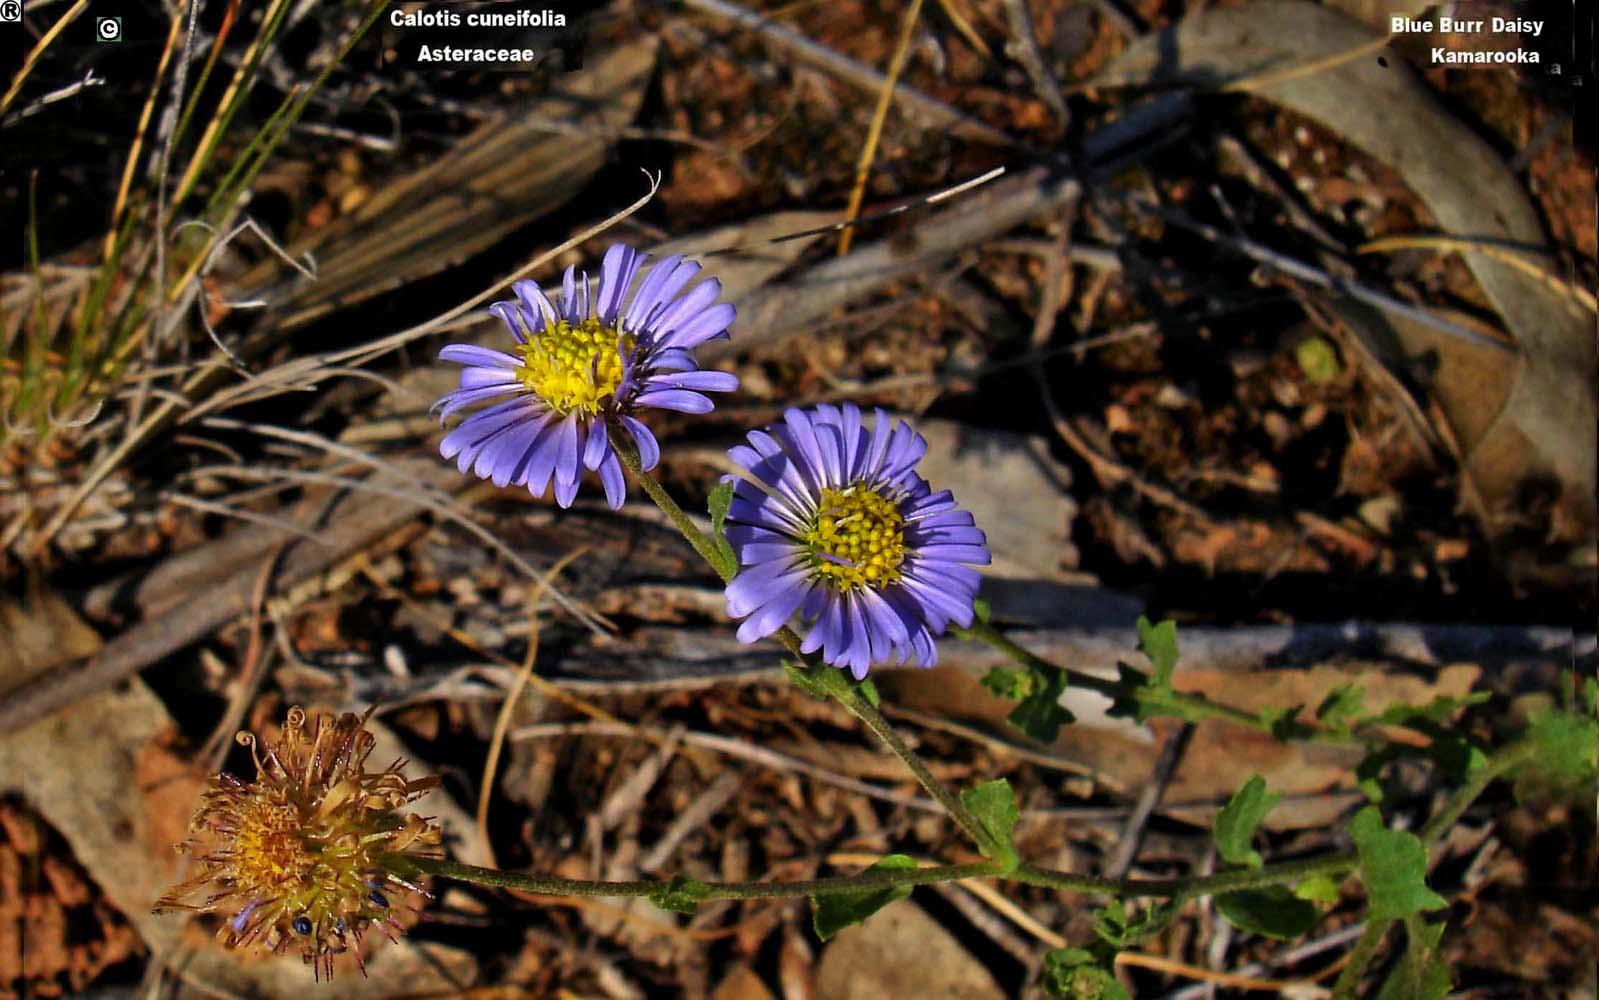 Calotis cuneifolia flora ALA source